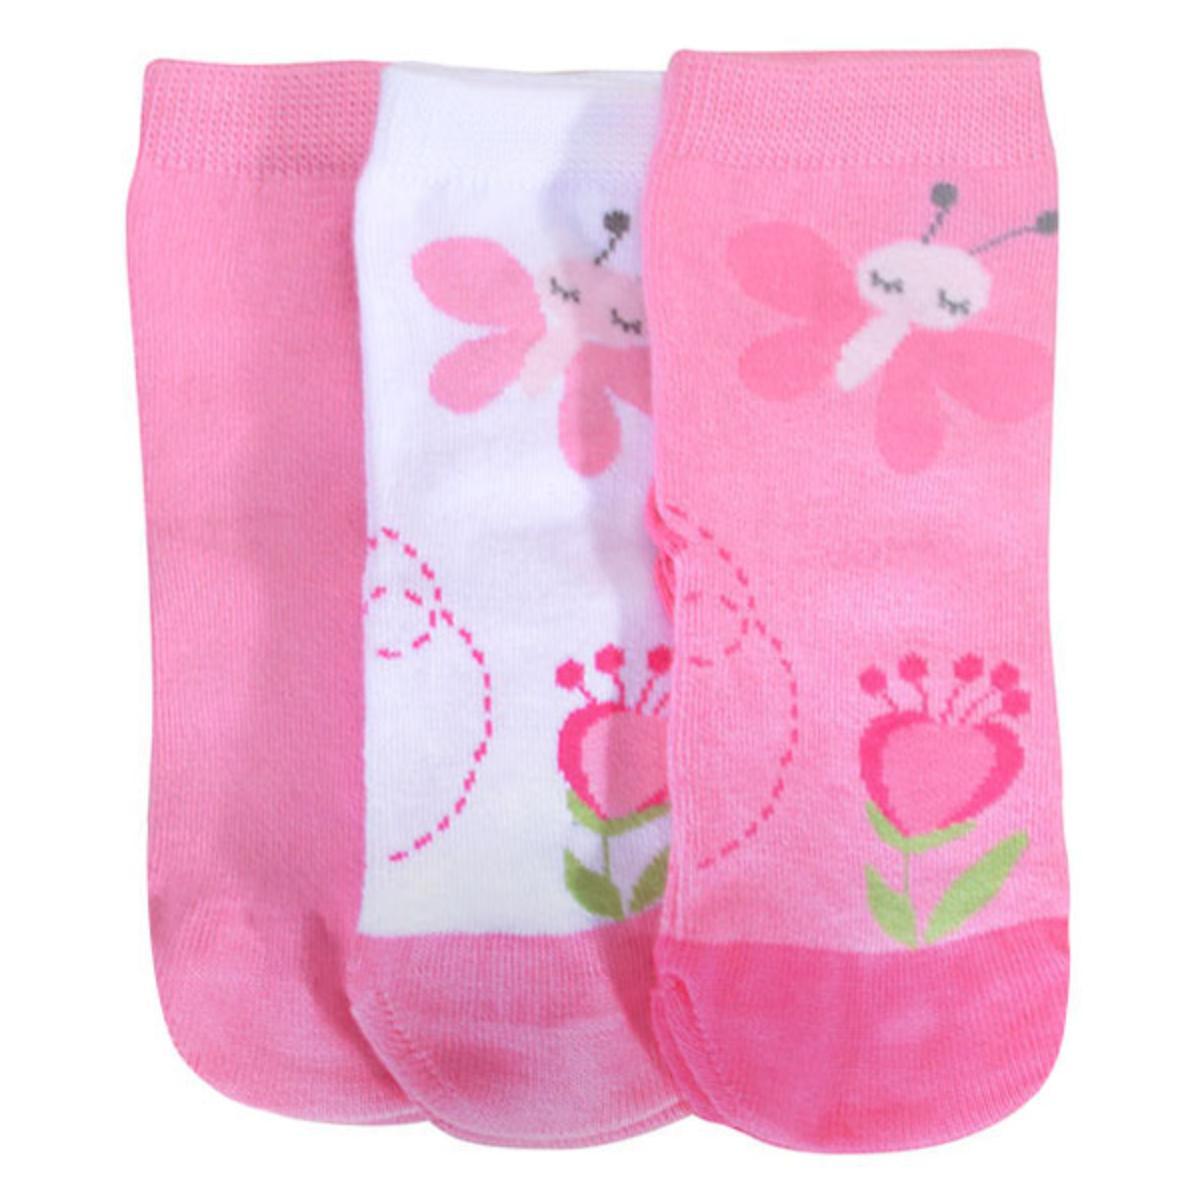 Meia Fem Infantil Lupo 2000 089 0920 Kit C/3 Branco/rosa